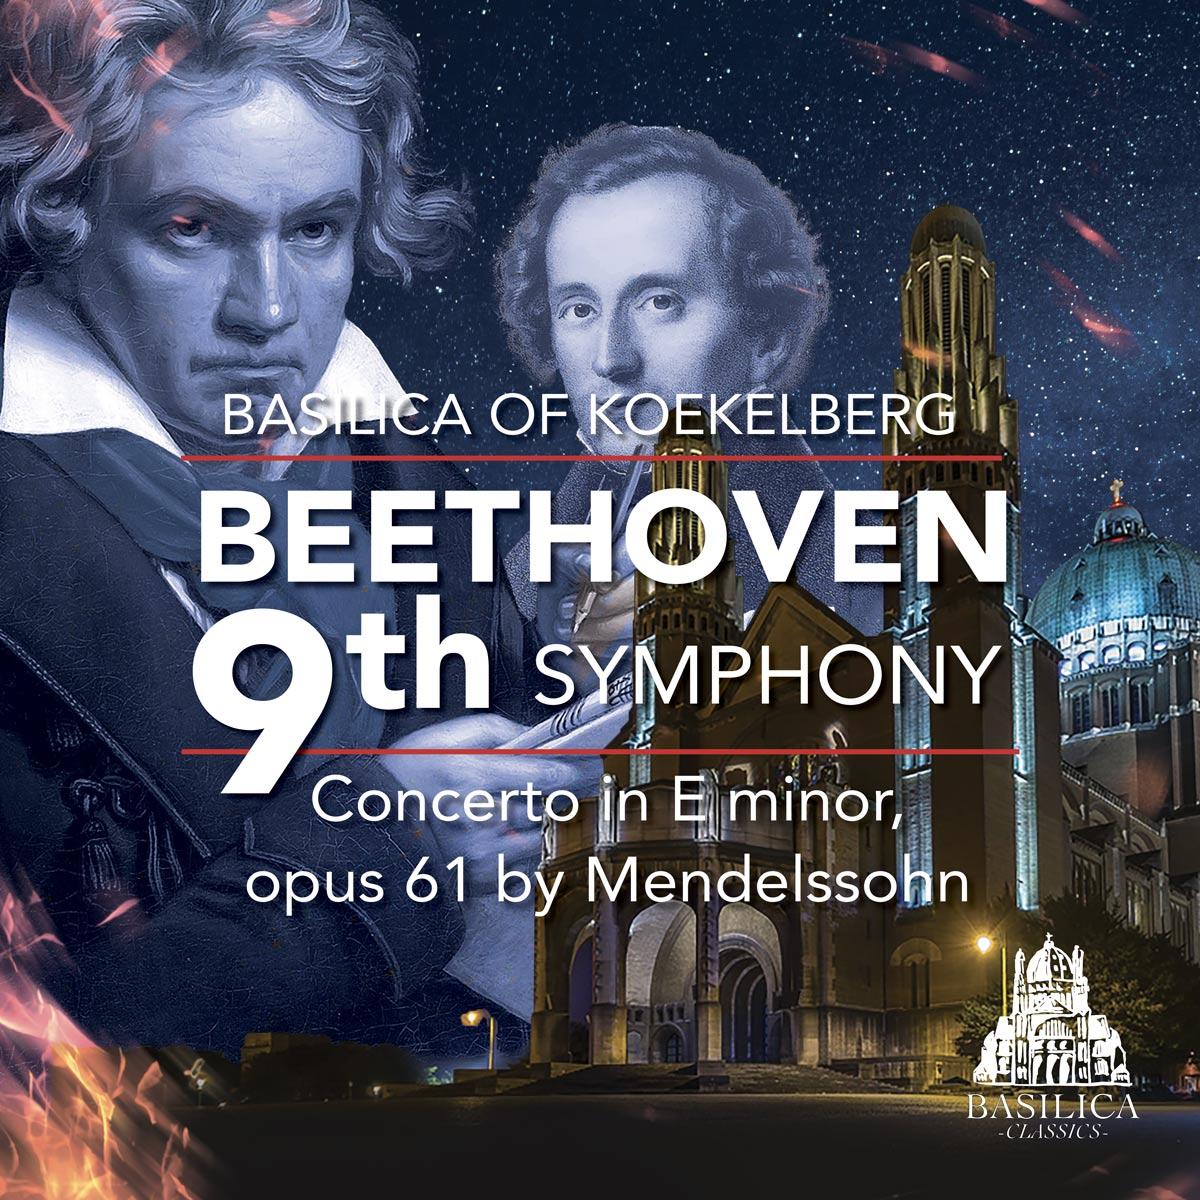 Beethoven 9th symphony, Concerto in E minor opus 61 bu Mendelssohn, National opera of Ukraine, Basilica of Koeklelberg